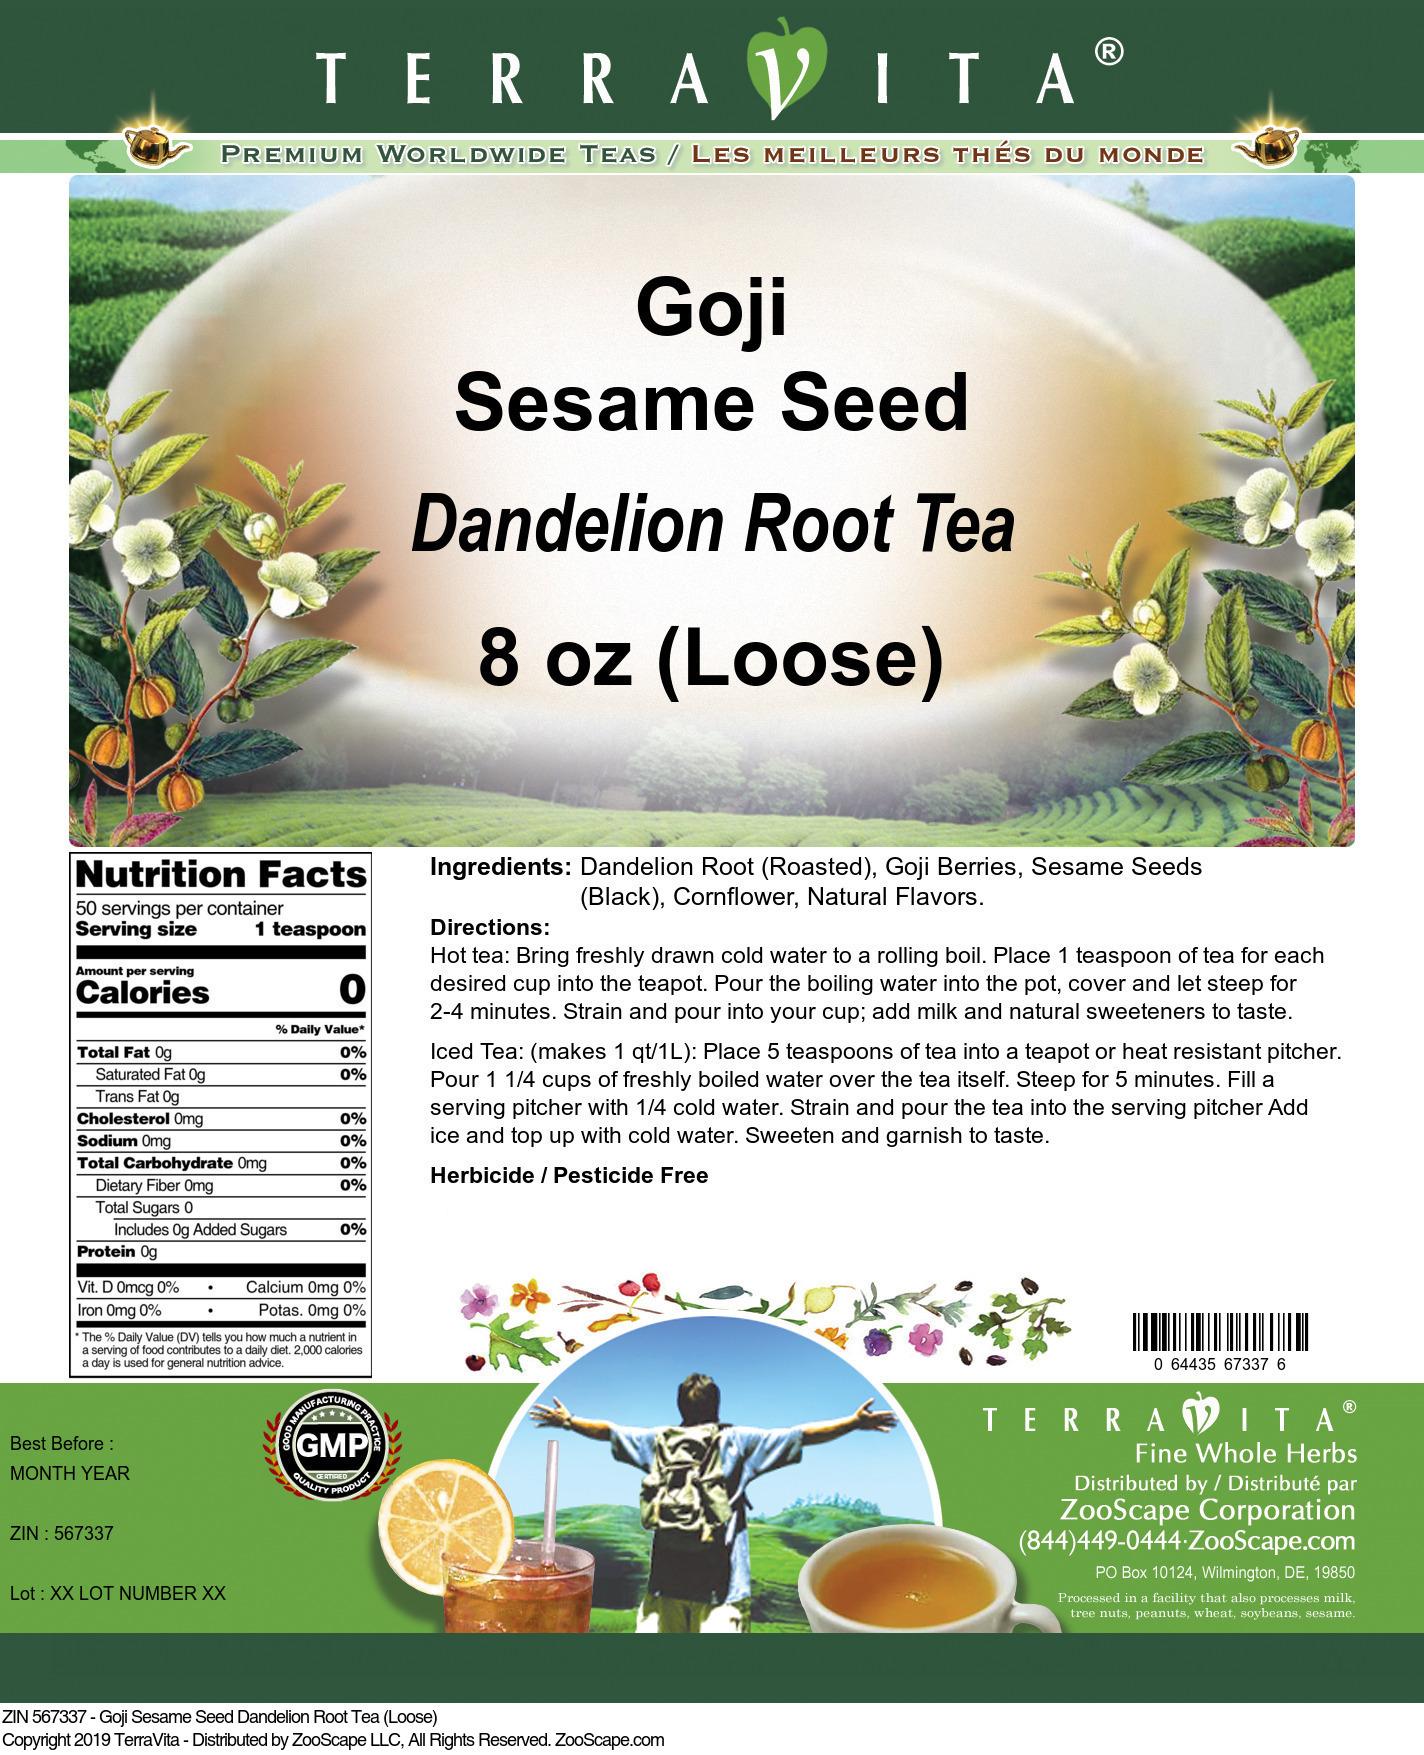 Goji Sesame Seed Dandelion Root Tea (Loose)